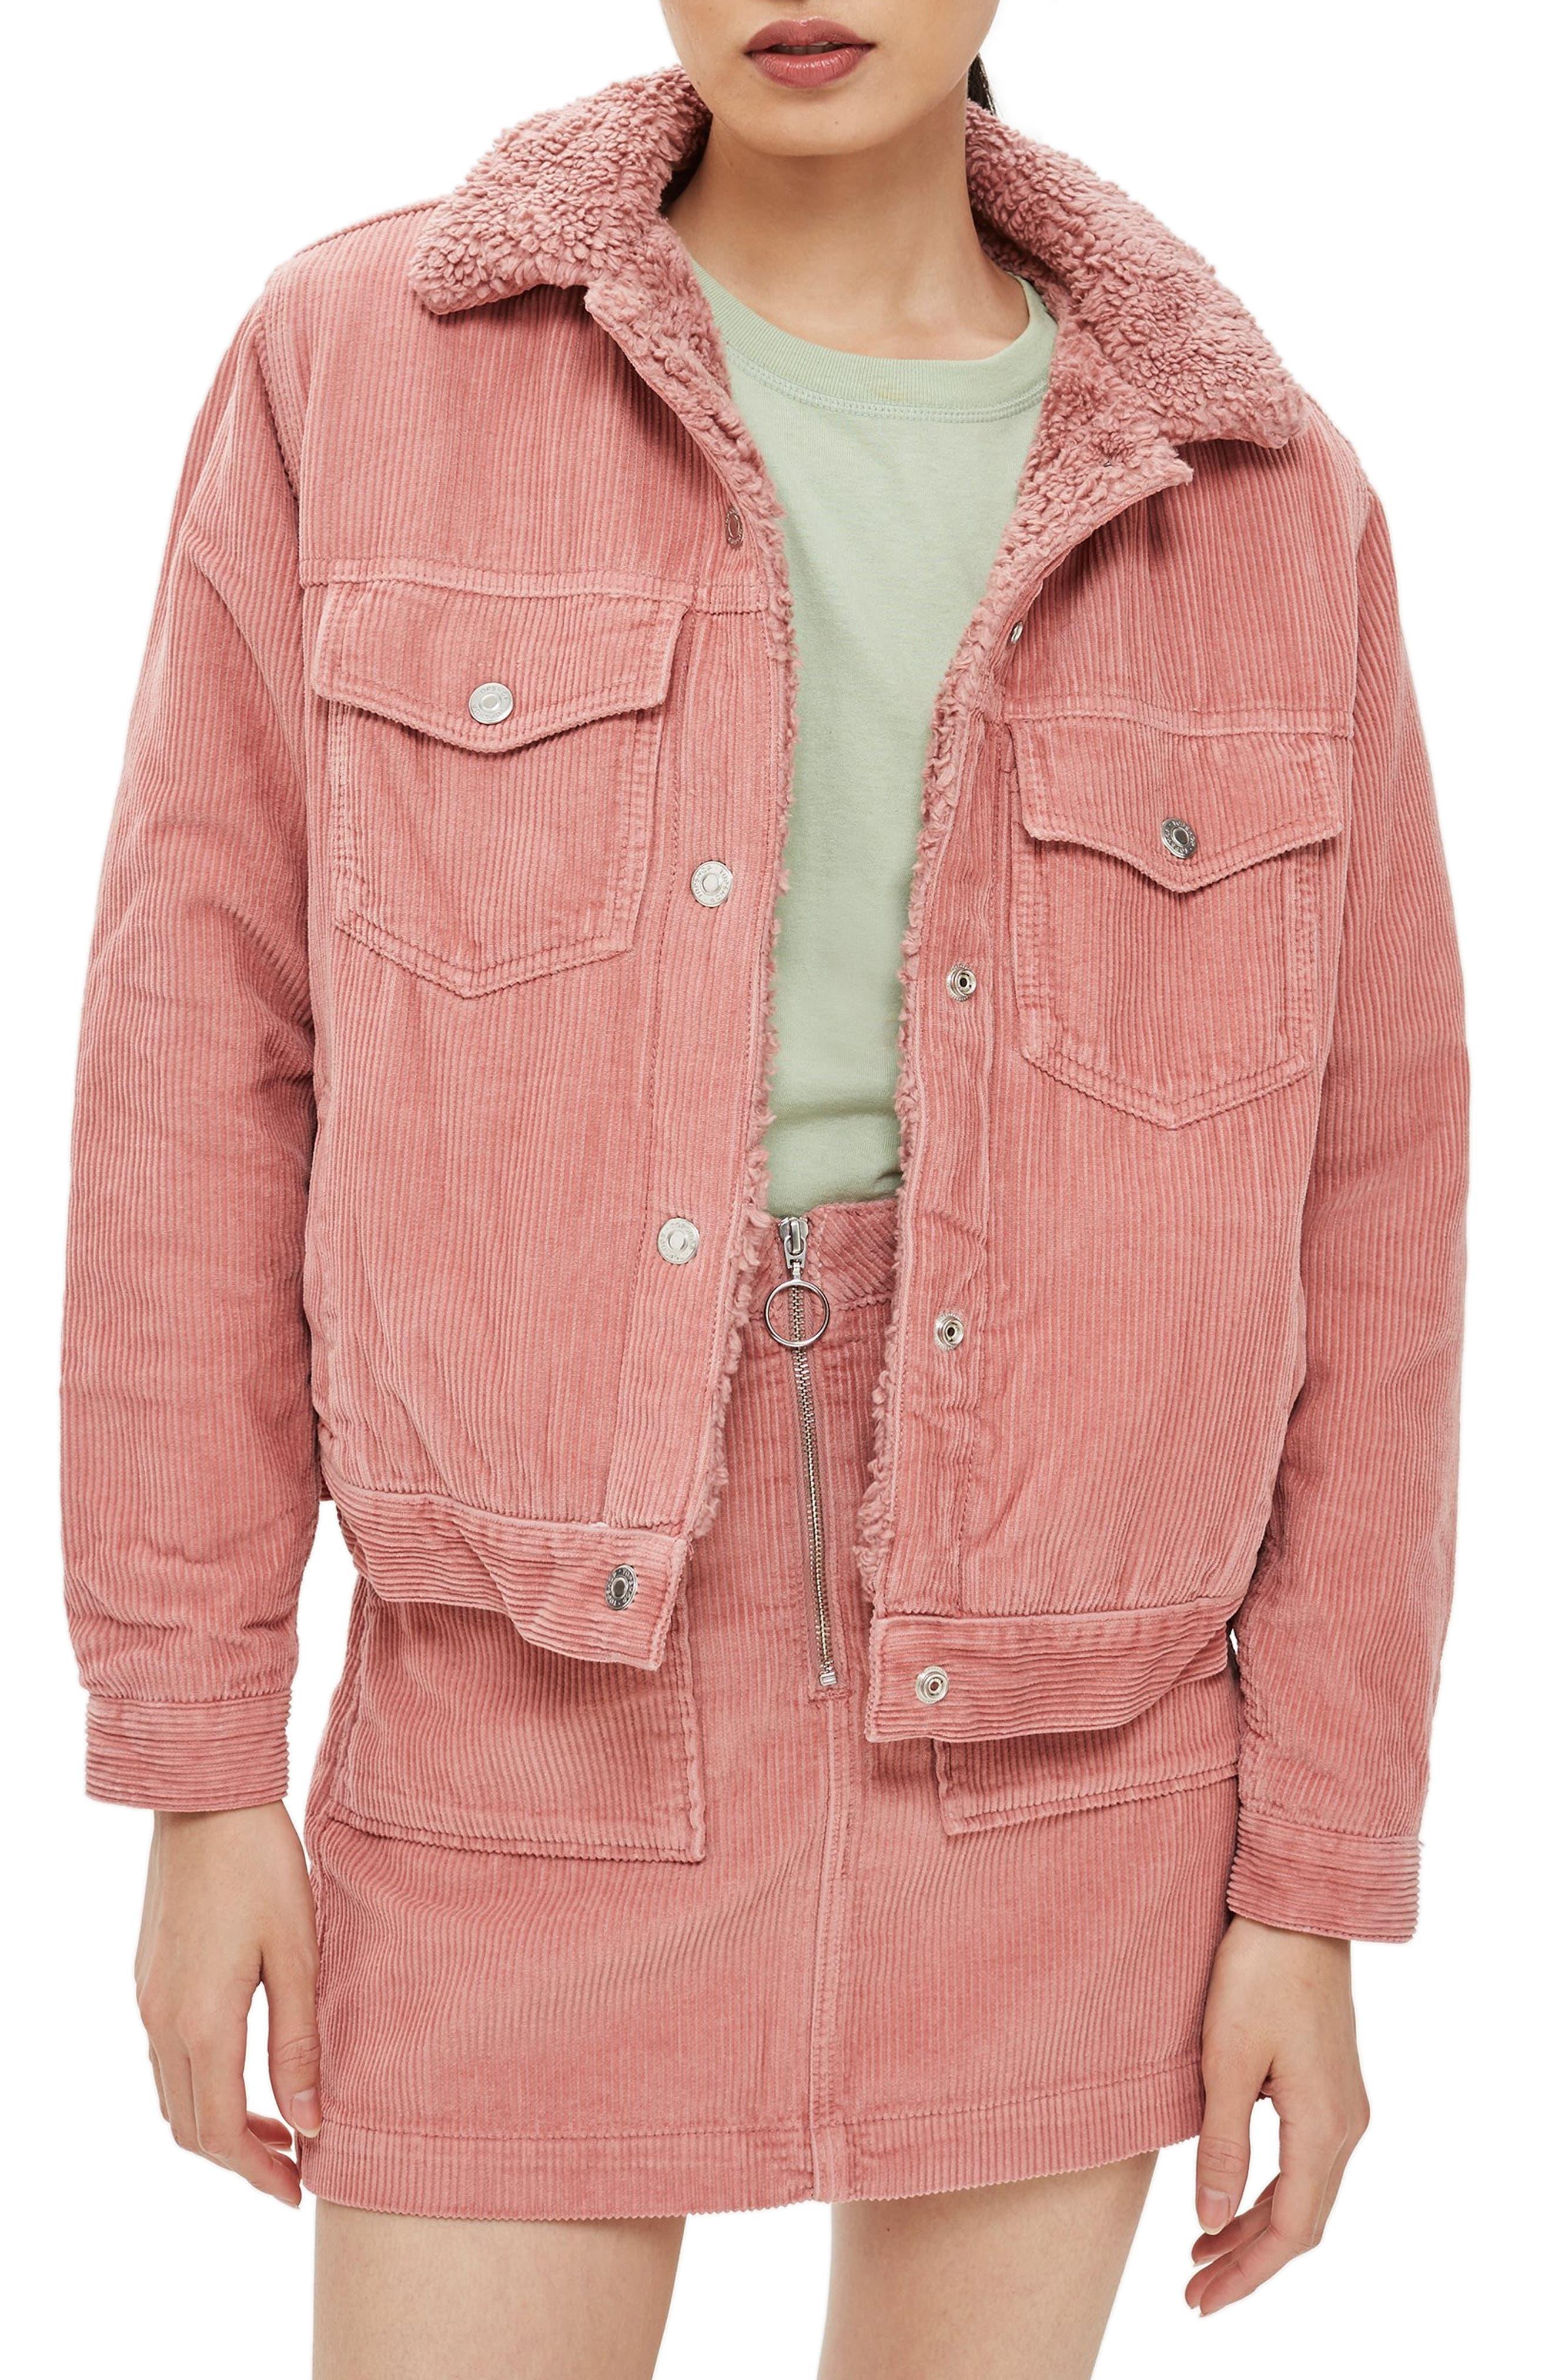 amp; Women's Jackets Nordstrom Jackets Women's Nordstrom amp; Coats Coats qRtEZU